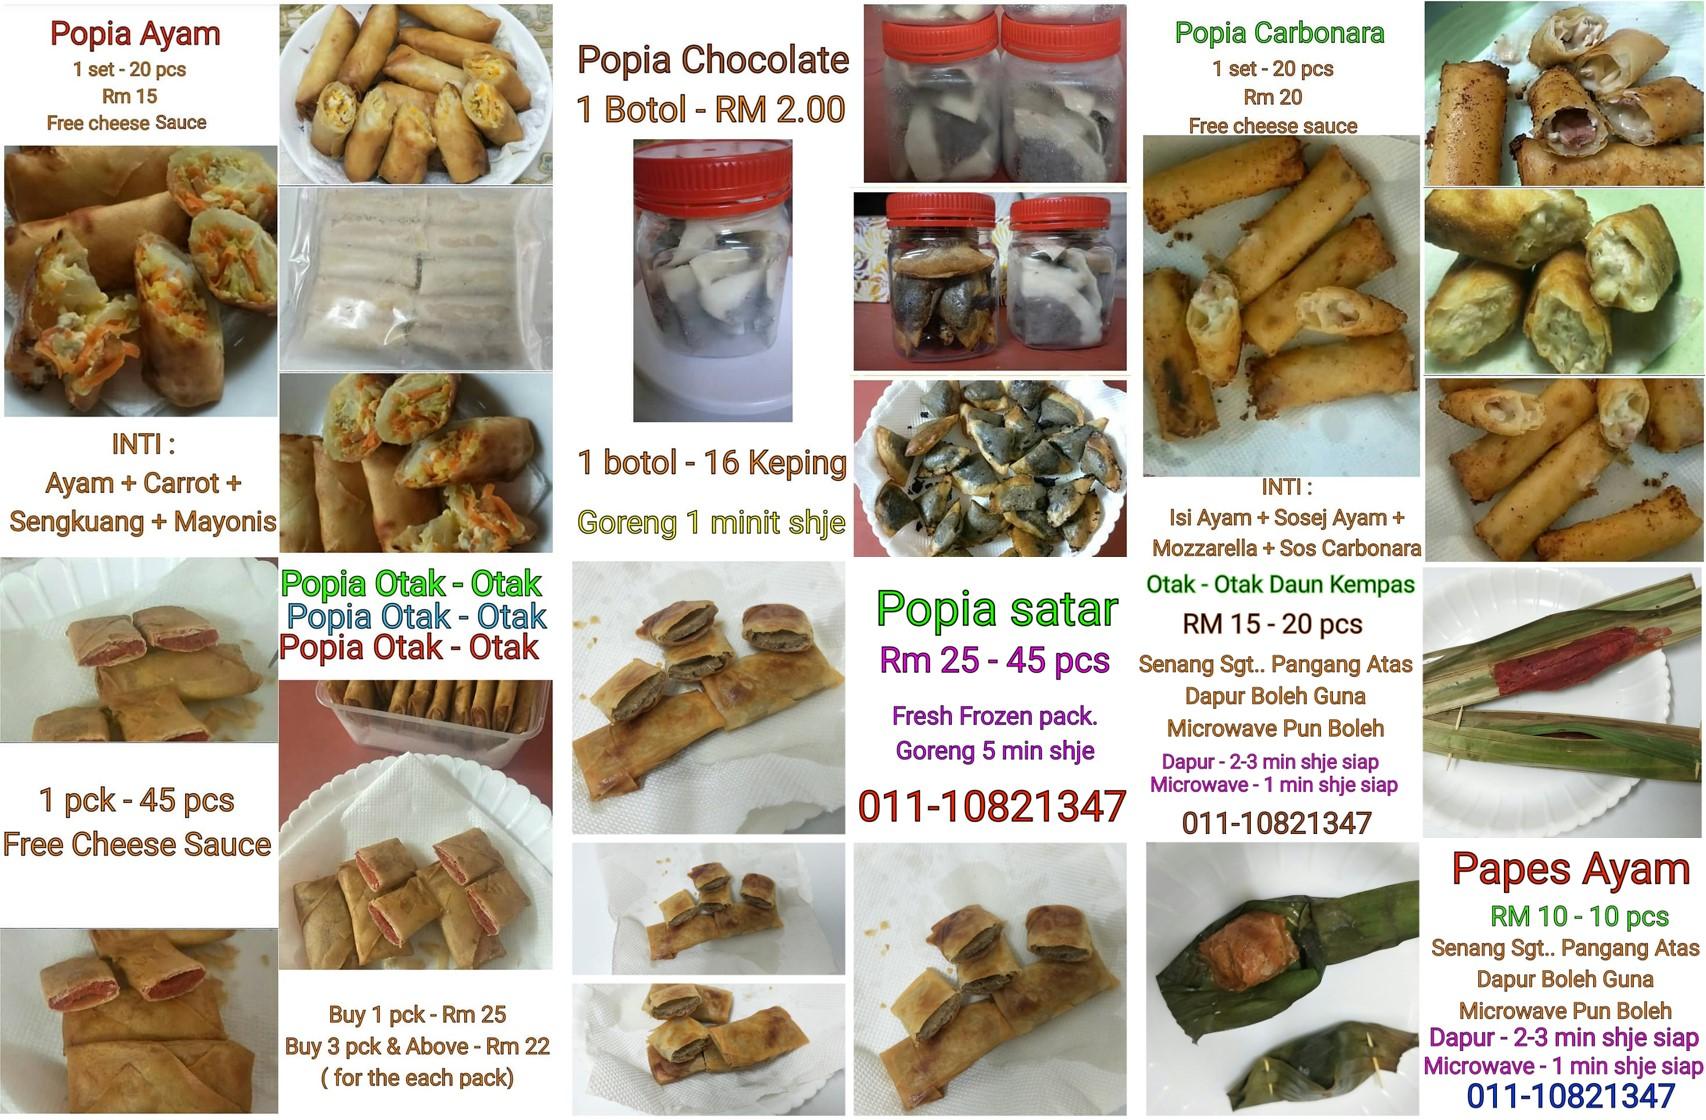 Kuih Raya Frozen Popia Ampang Jaya, Platform, Pusat, Membina, Bina, Website, Peniaga, e-PKS, Atas-talian, Online